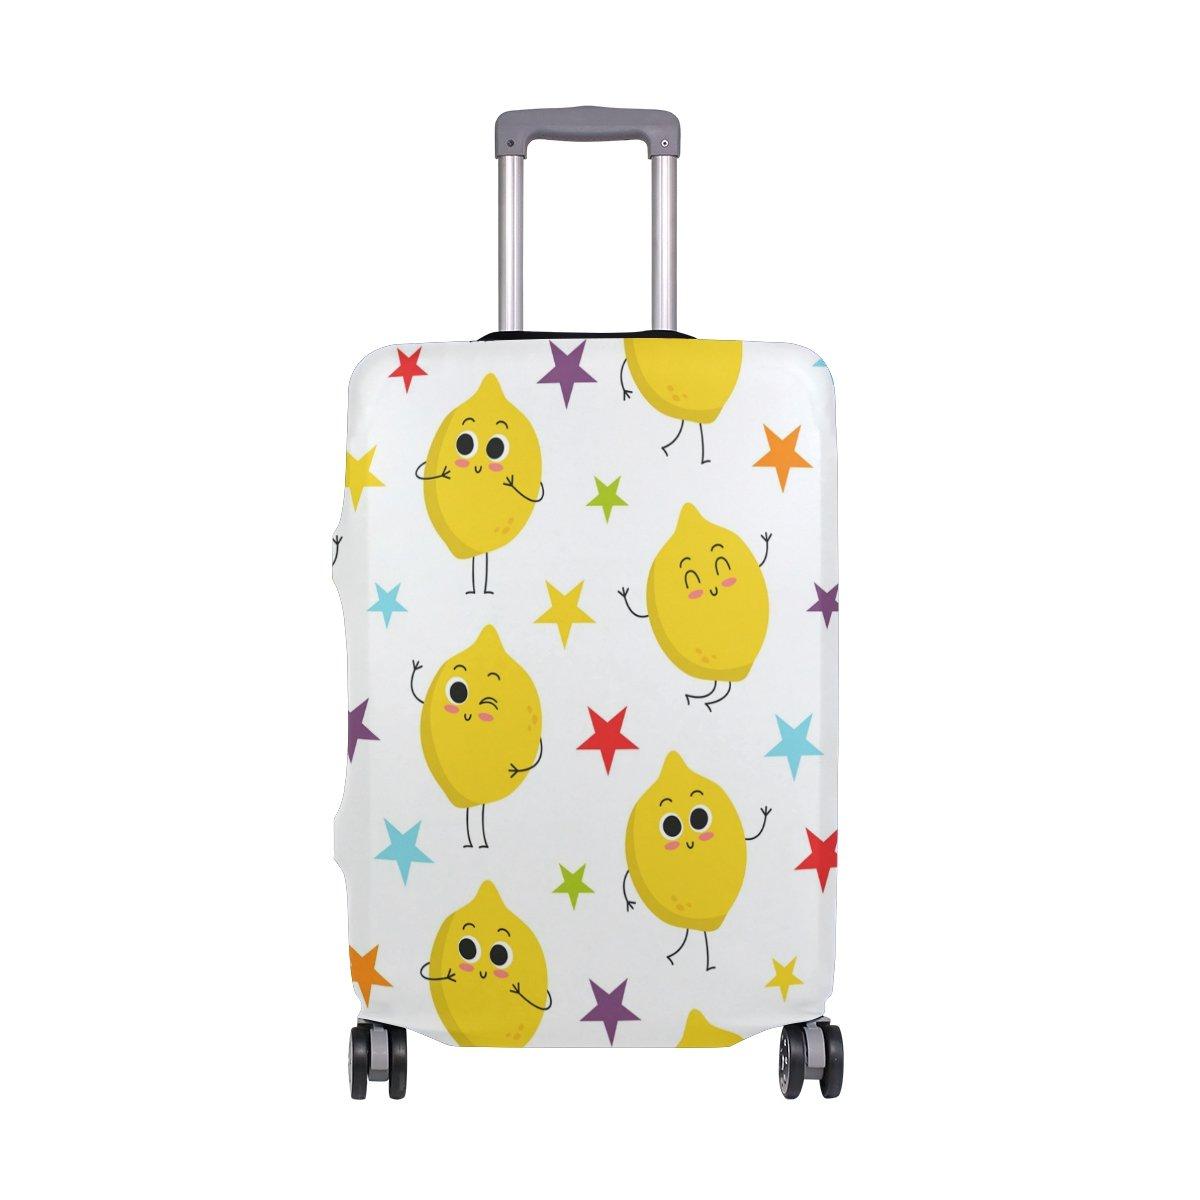 Cute Lemon Emoji Stars Summer Spring Suitcase Luggage Cover Protector for Travel Kids Men Women